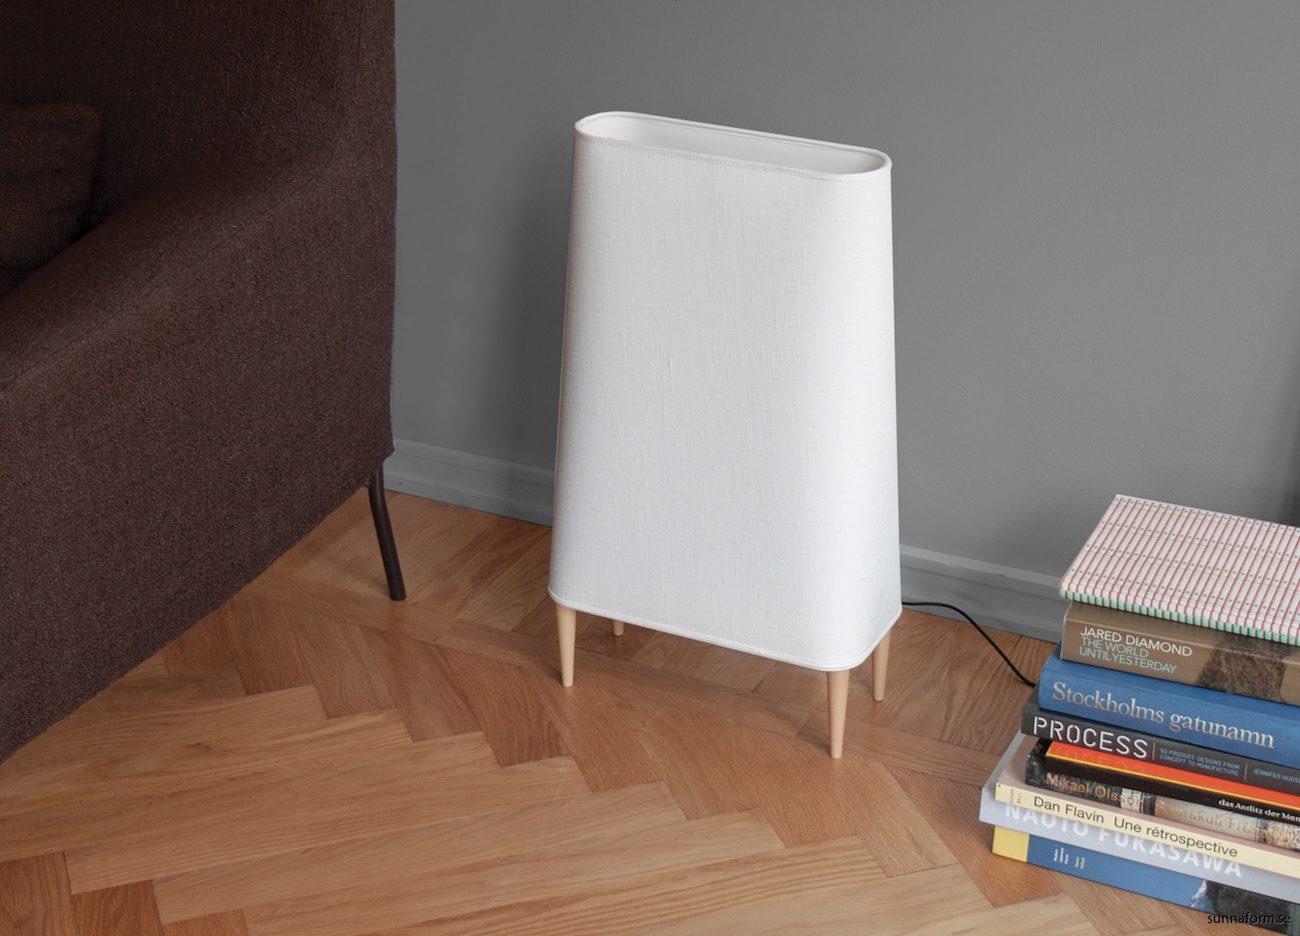 Sunnaform S5 Air Purifier And Designer Lamp